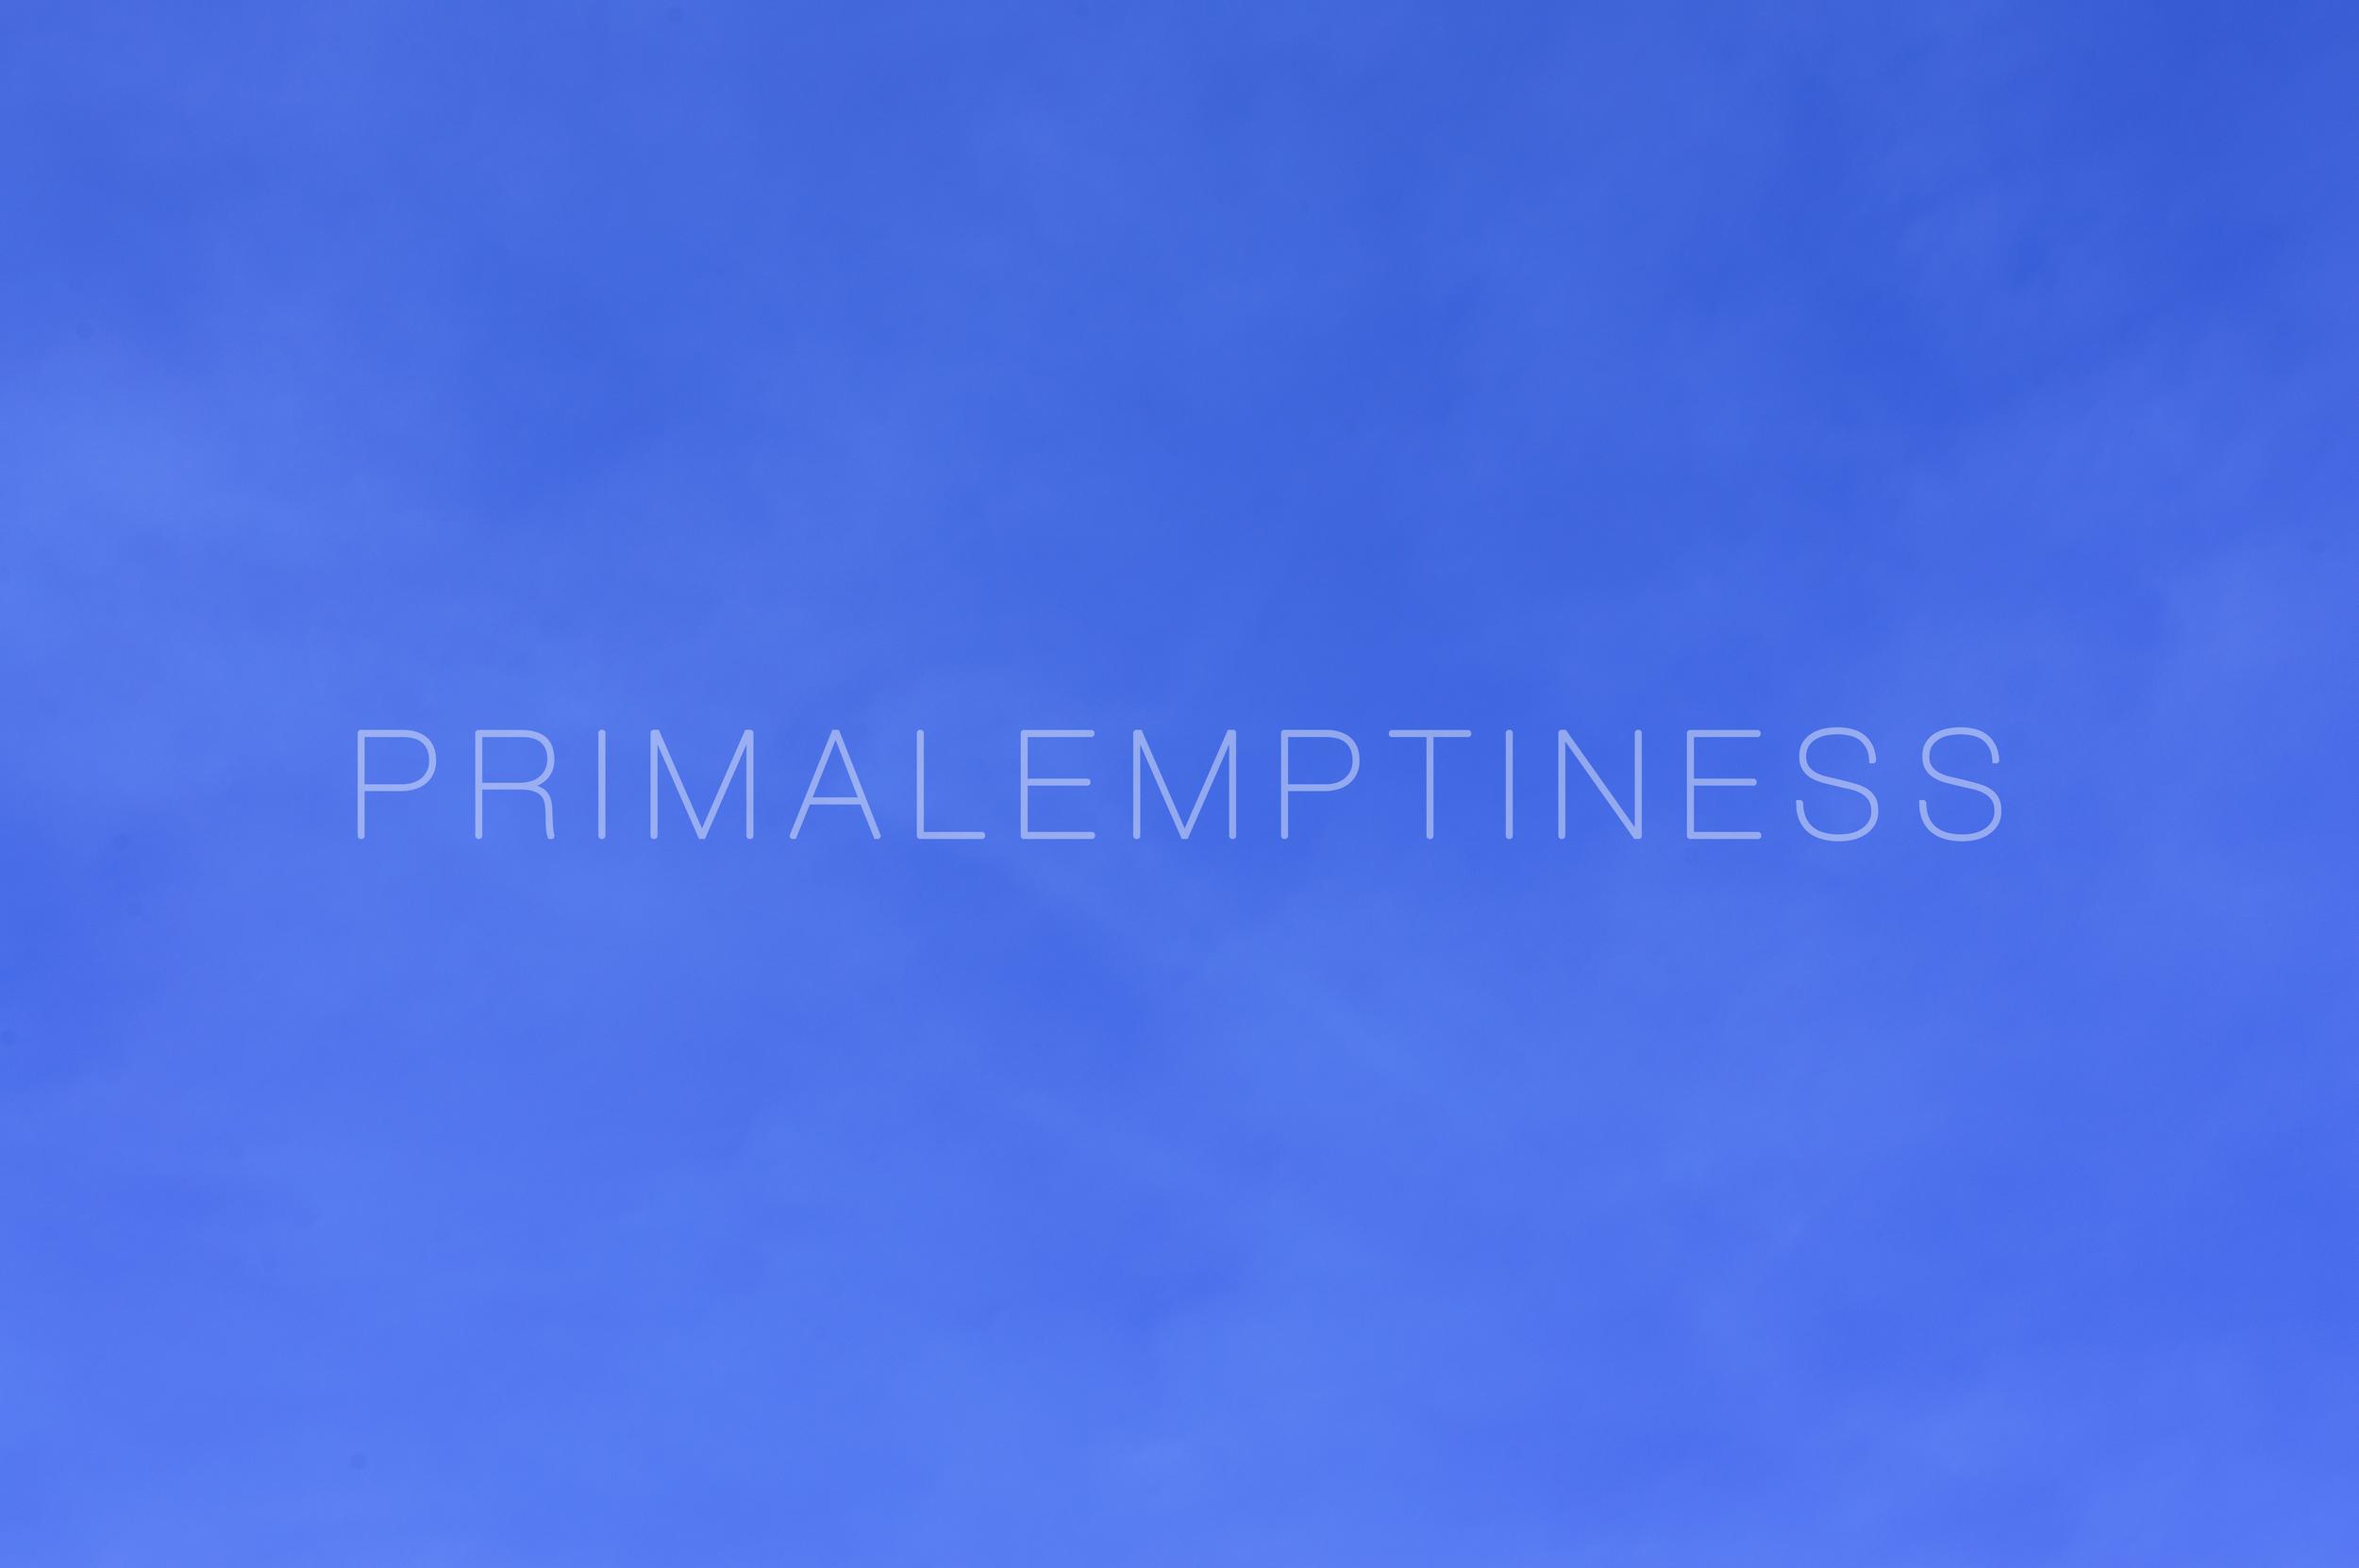 PRIMALEMPTINESS.jpg